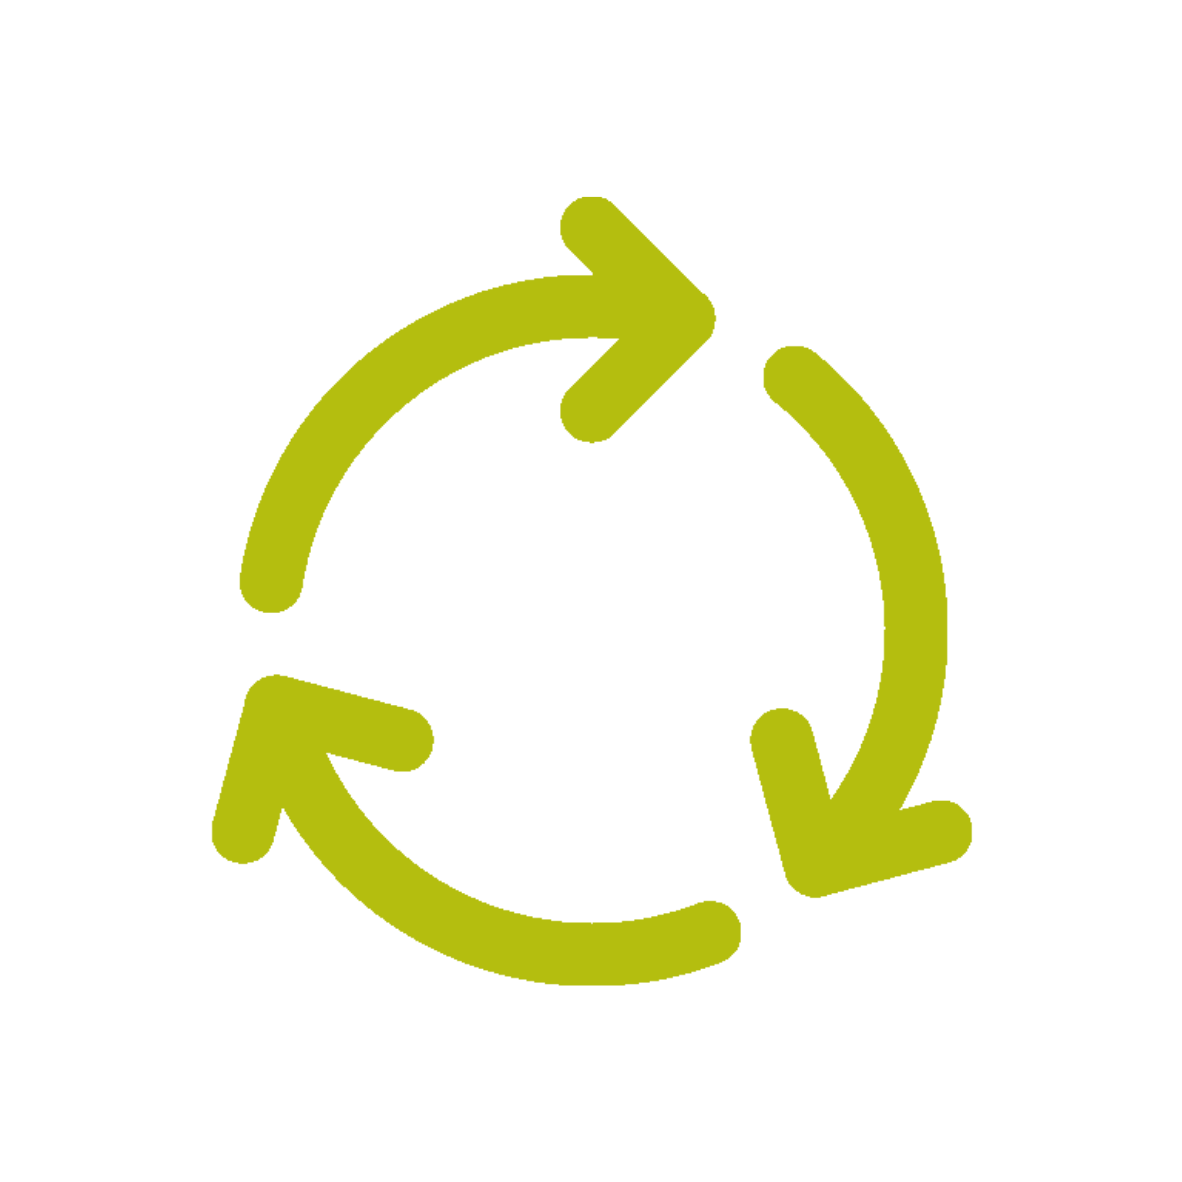 workflow optimization green